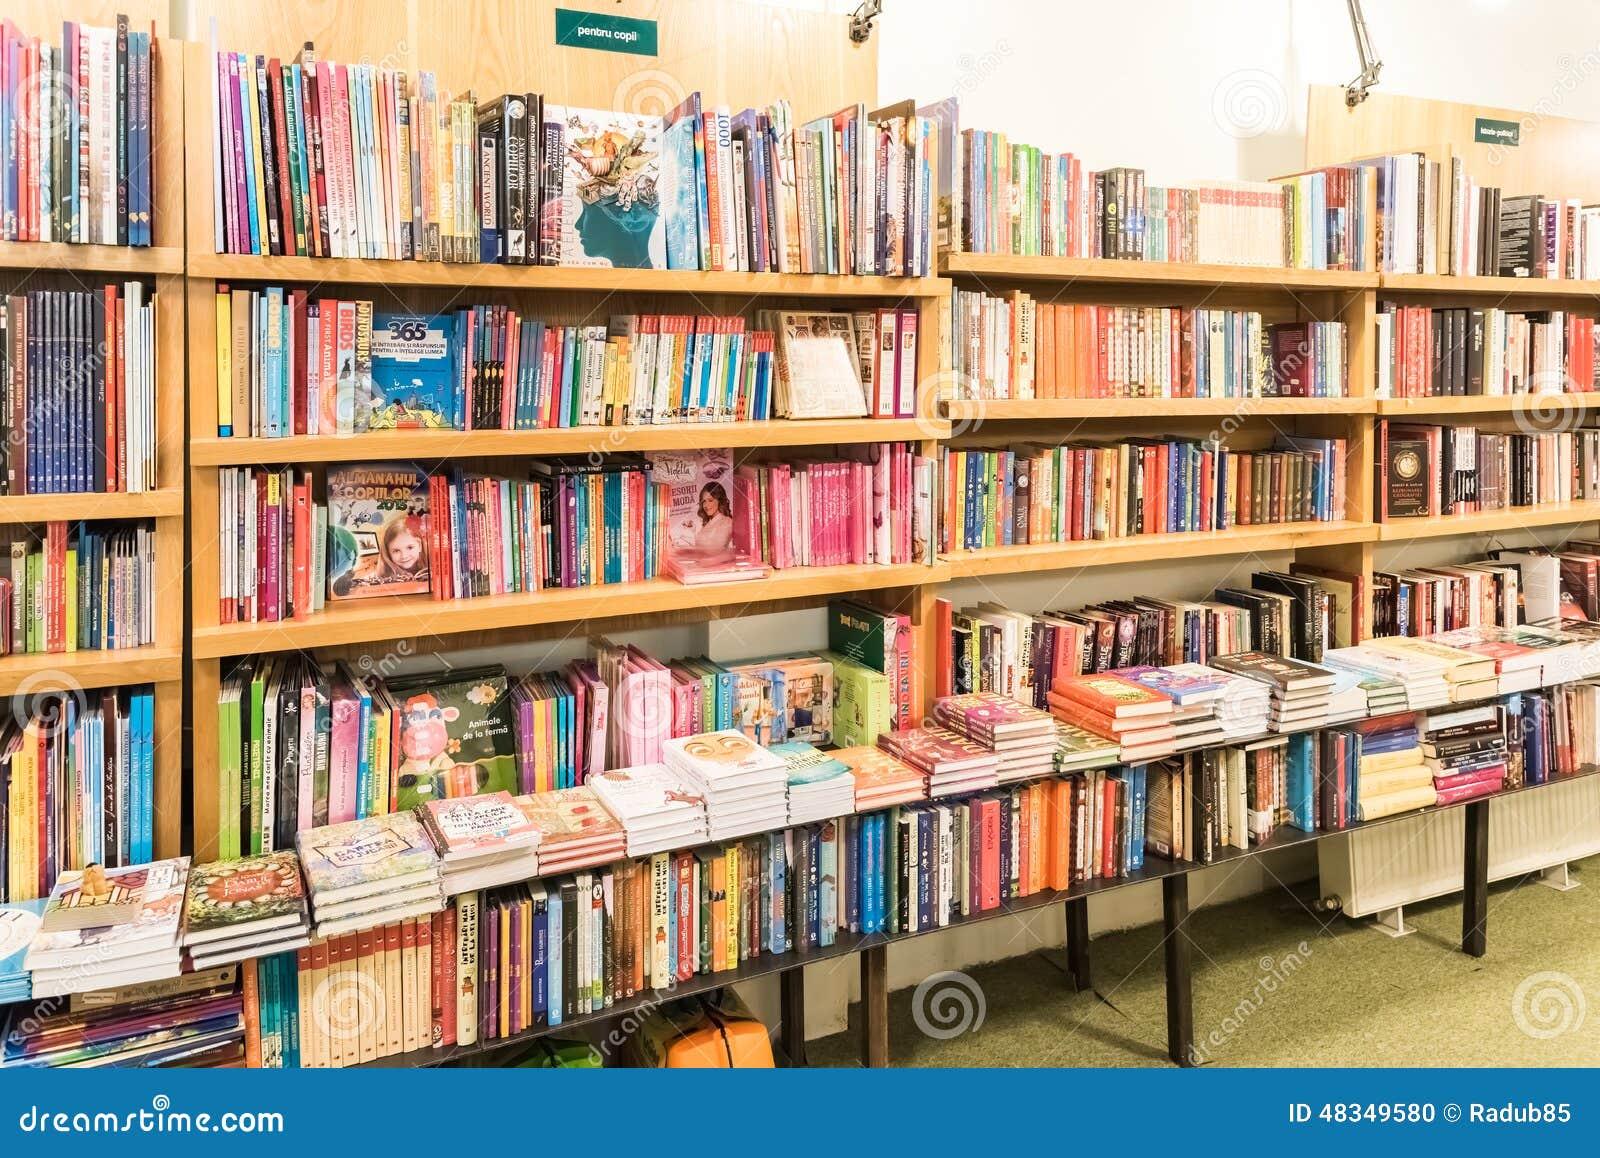 tag re avec des livres dans la biblioth que image ditorial image 48349580. Black Bedroom Furniture Sets. Home Design Ideas